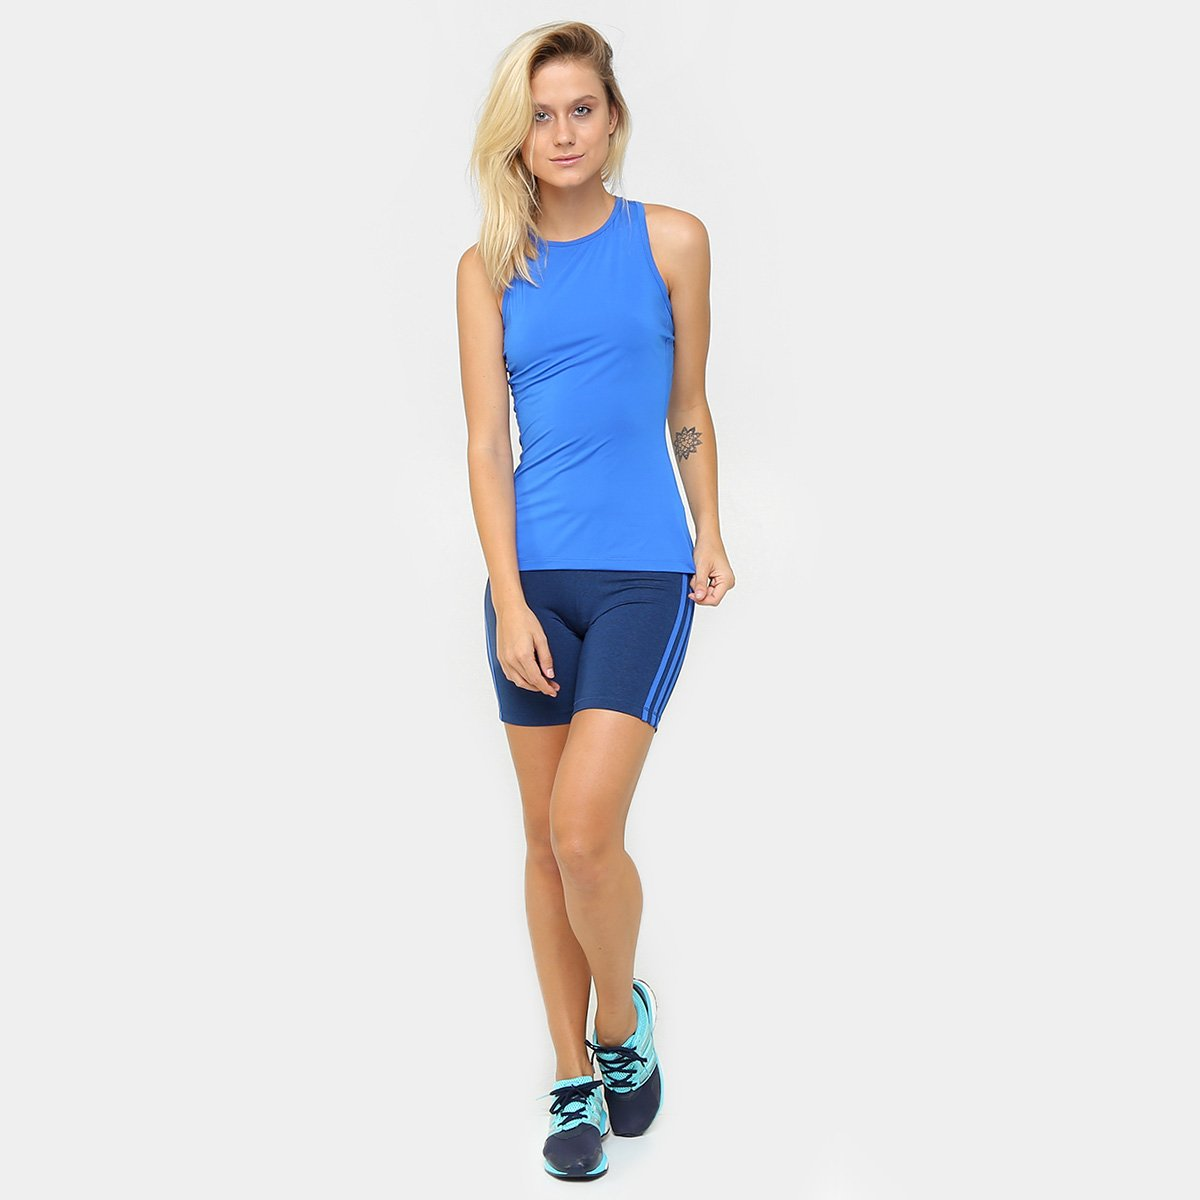 a5715c0842 Regata Adidas Speed Fitted Feminina - Azul - Compre Agora